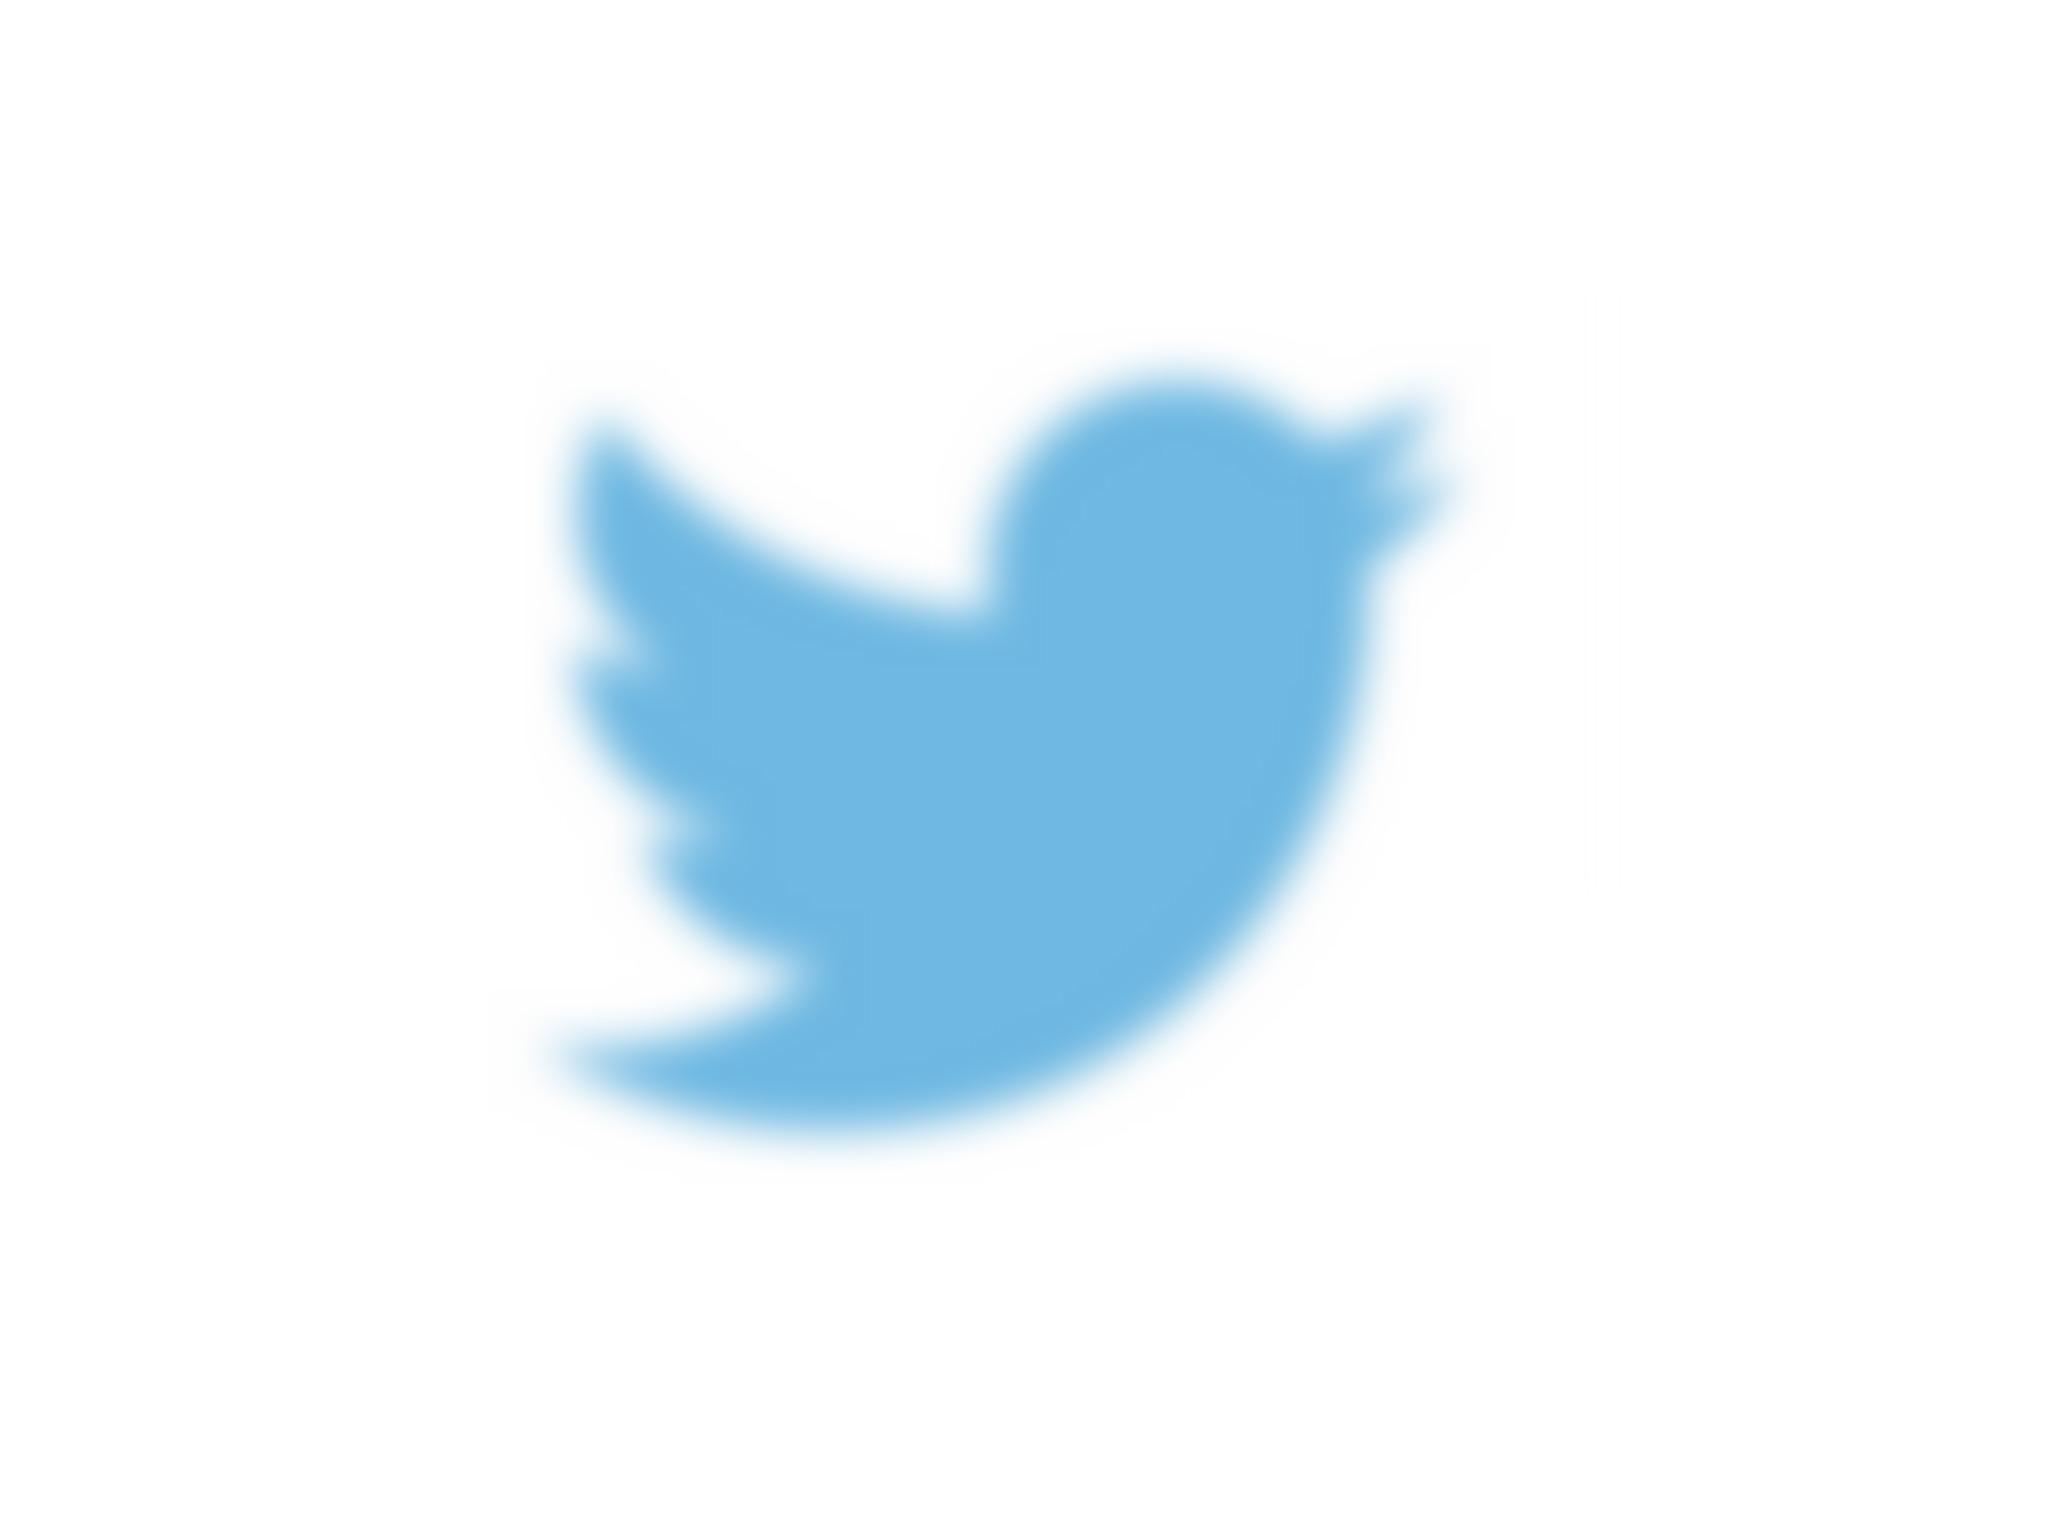 Twitter blurred